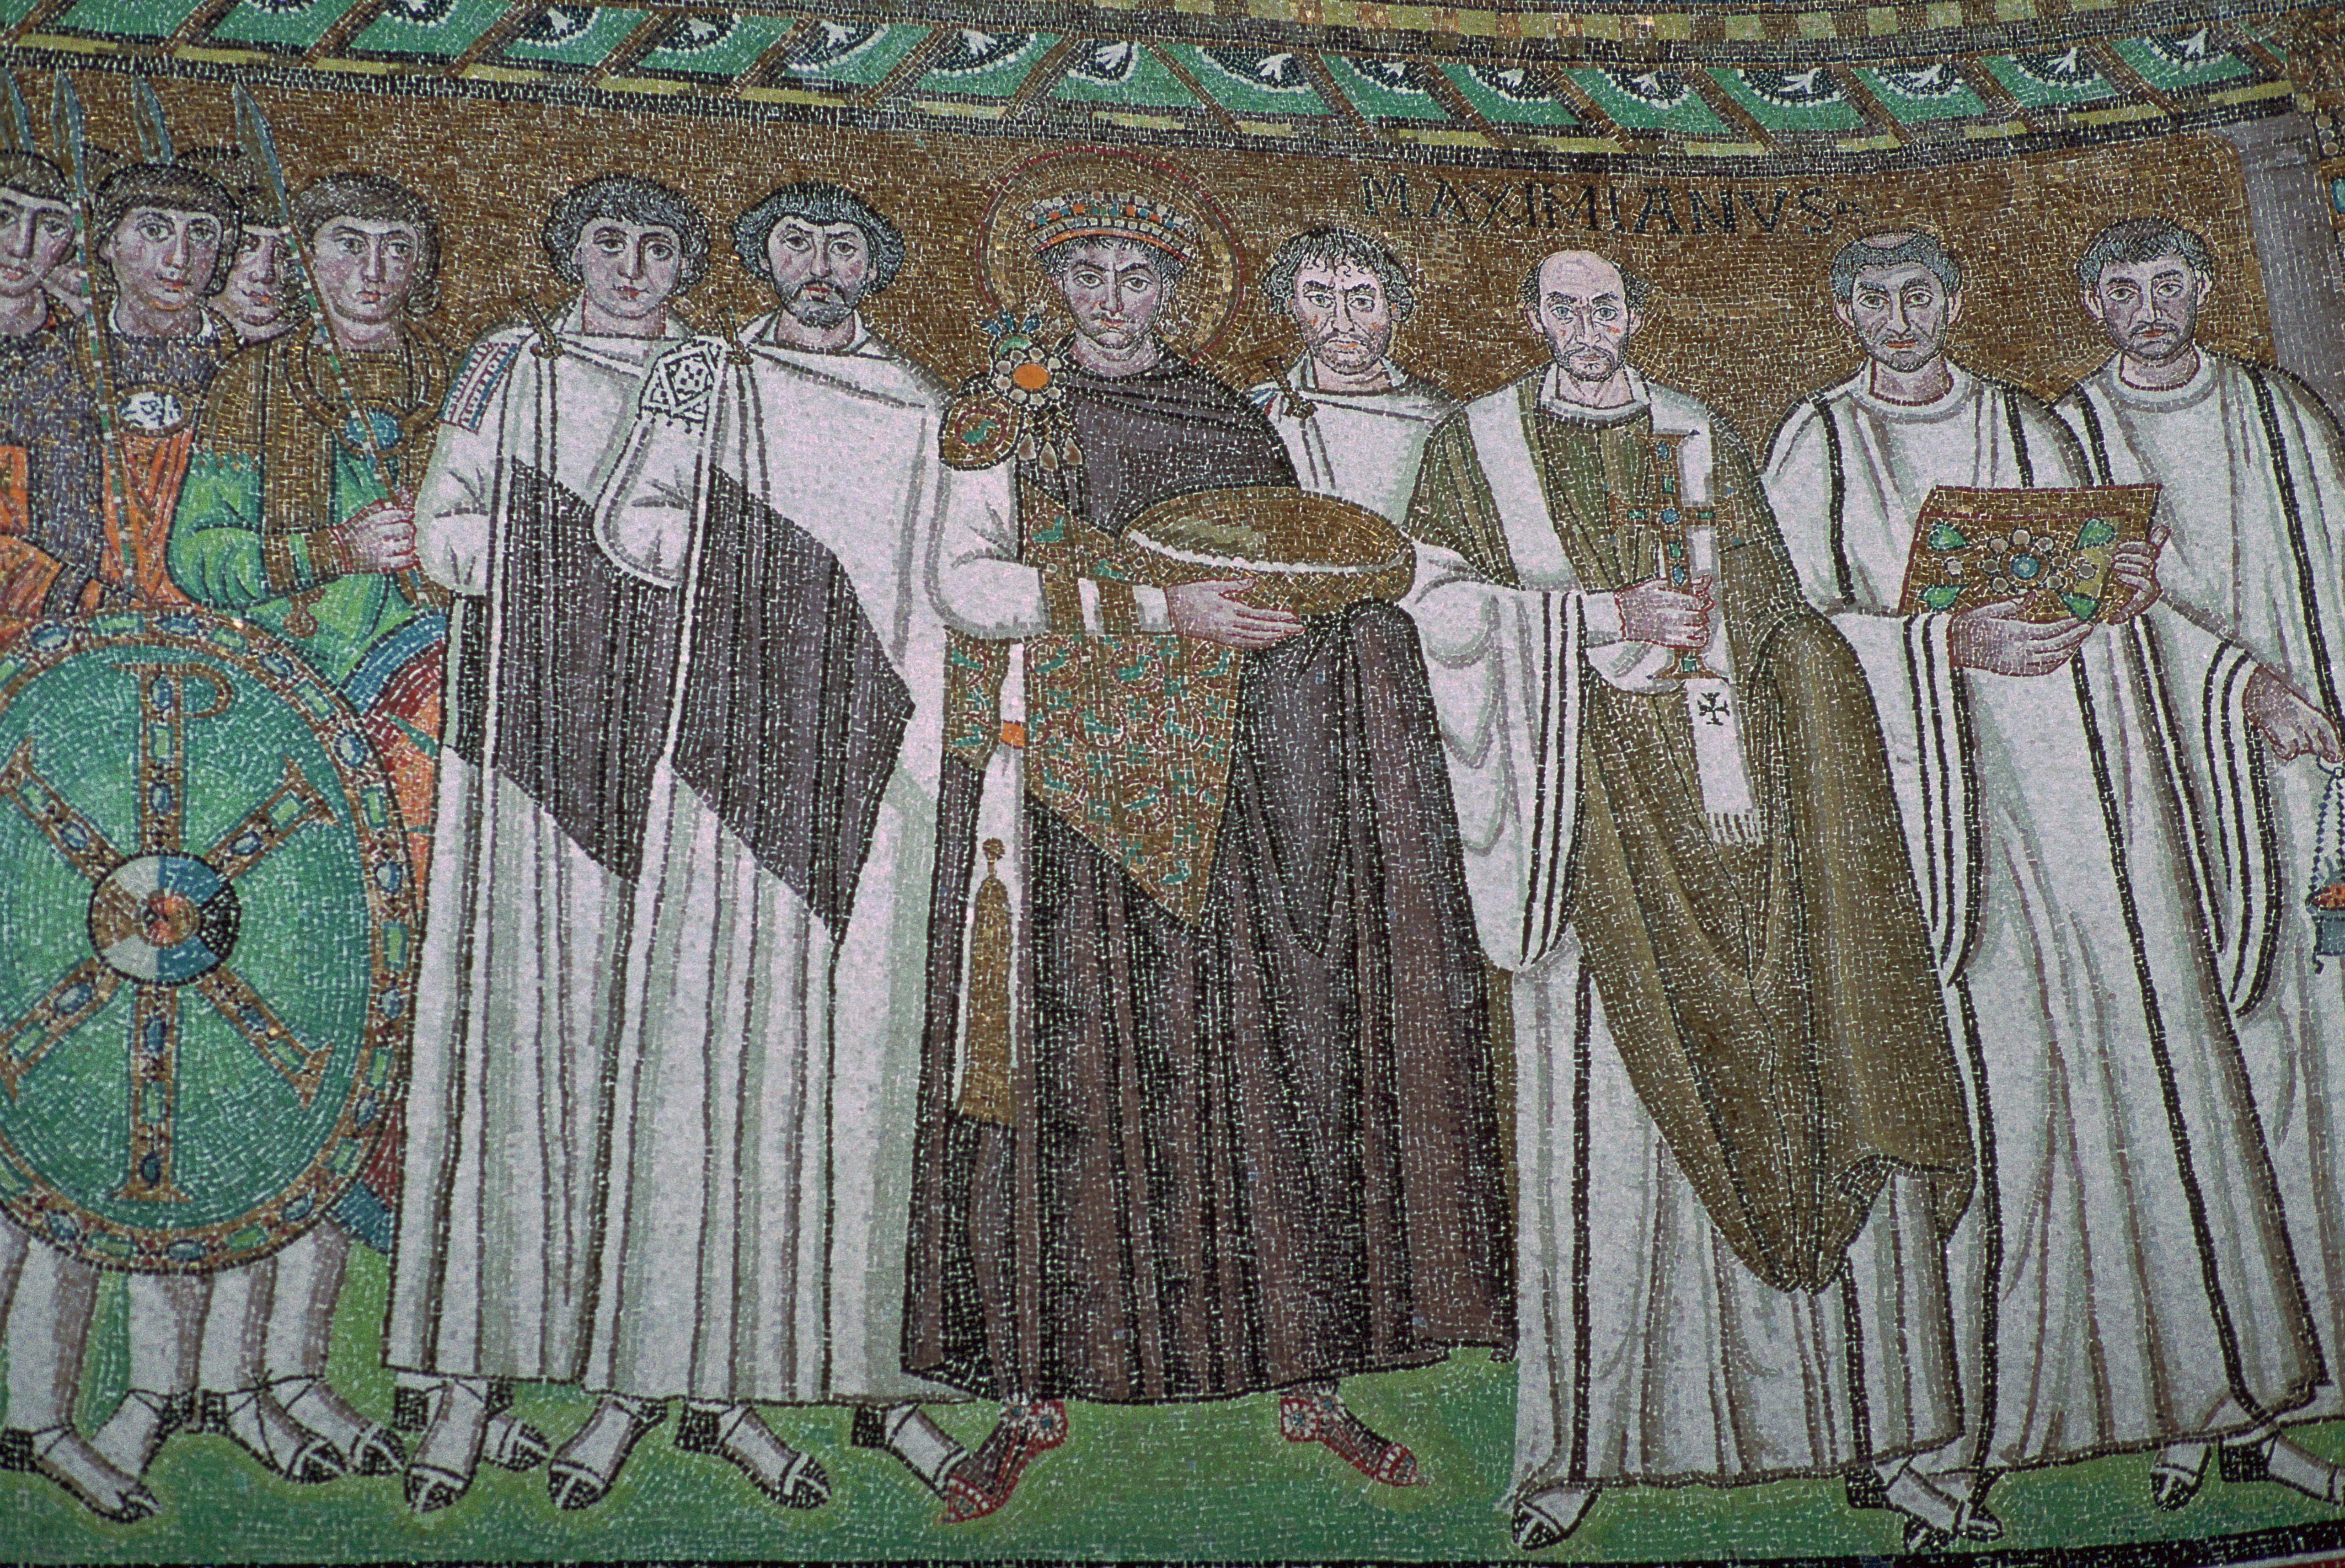 mosaic of a dozen men holding armor, crosses, and a basket